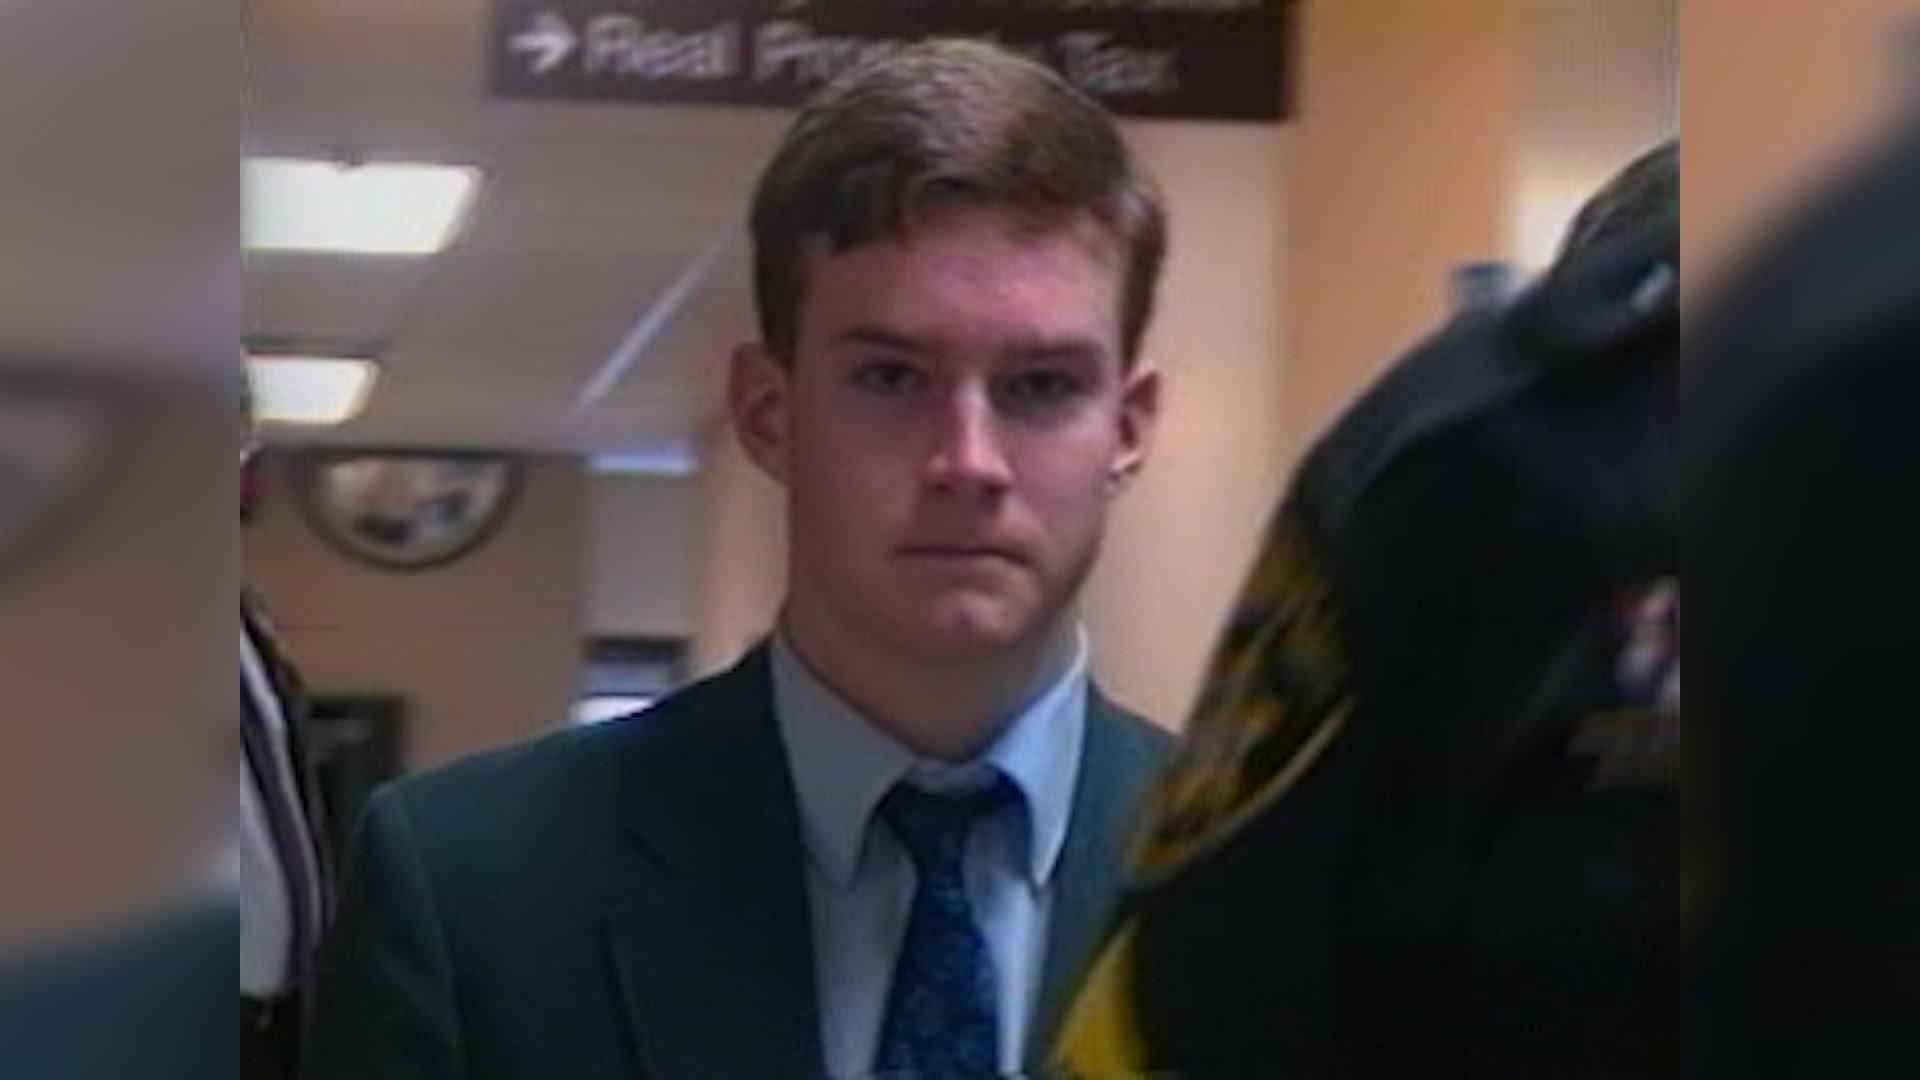 First parole hearing scheduled for Watkins Glen man convicted of murdering girlfriend